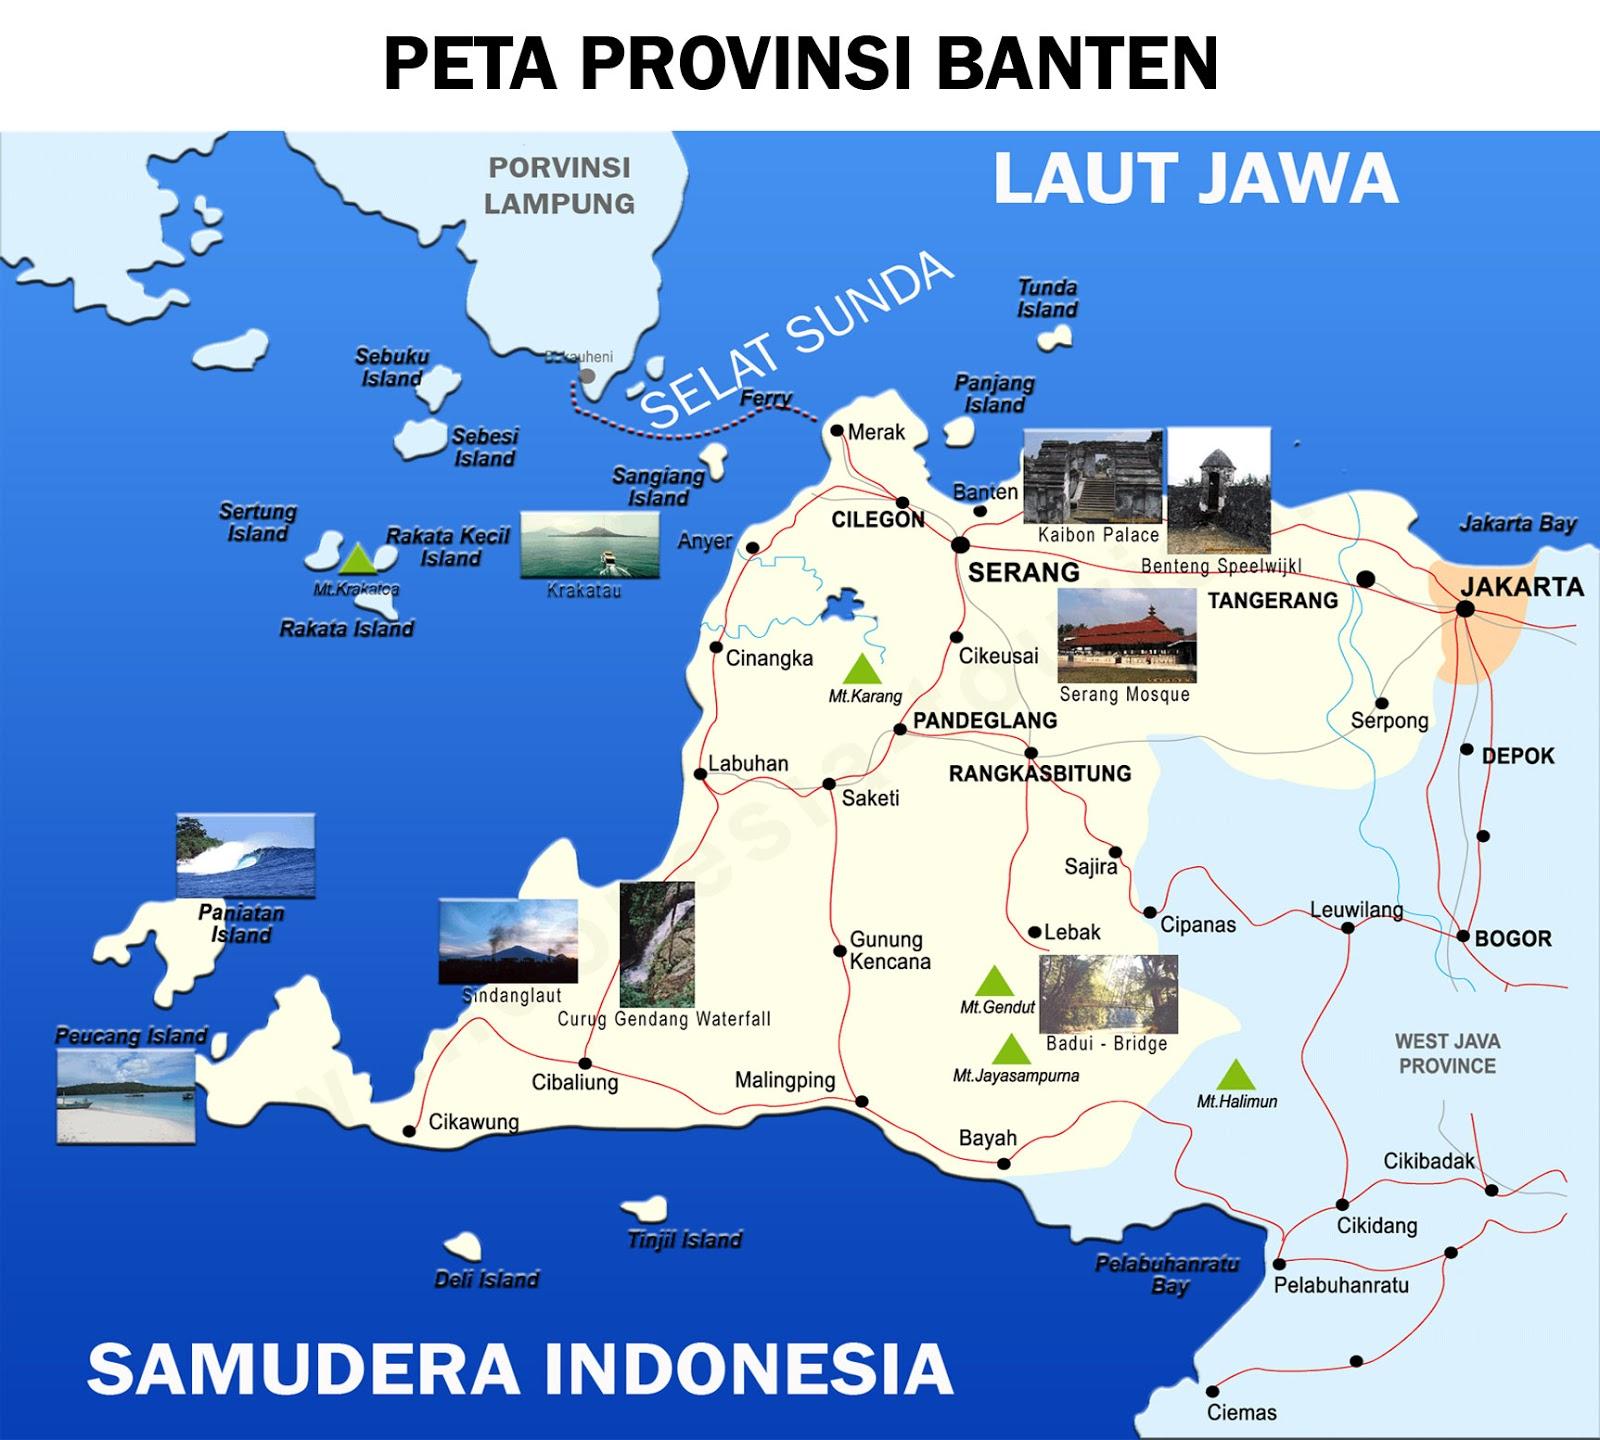 Peta Banten Lengkap 4 Provinsi Kota Sejarah Negara Gambar Buta